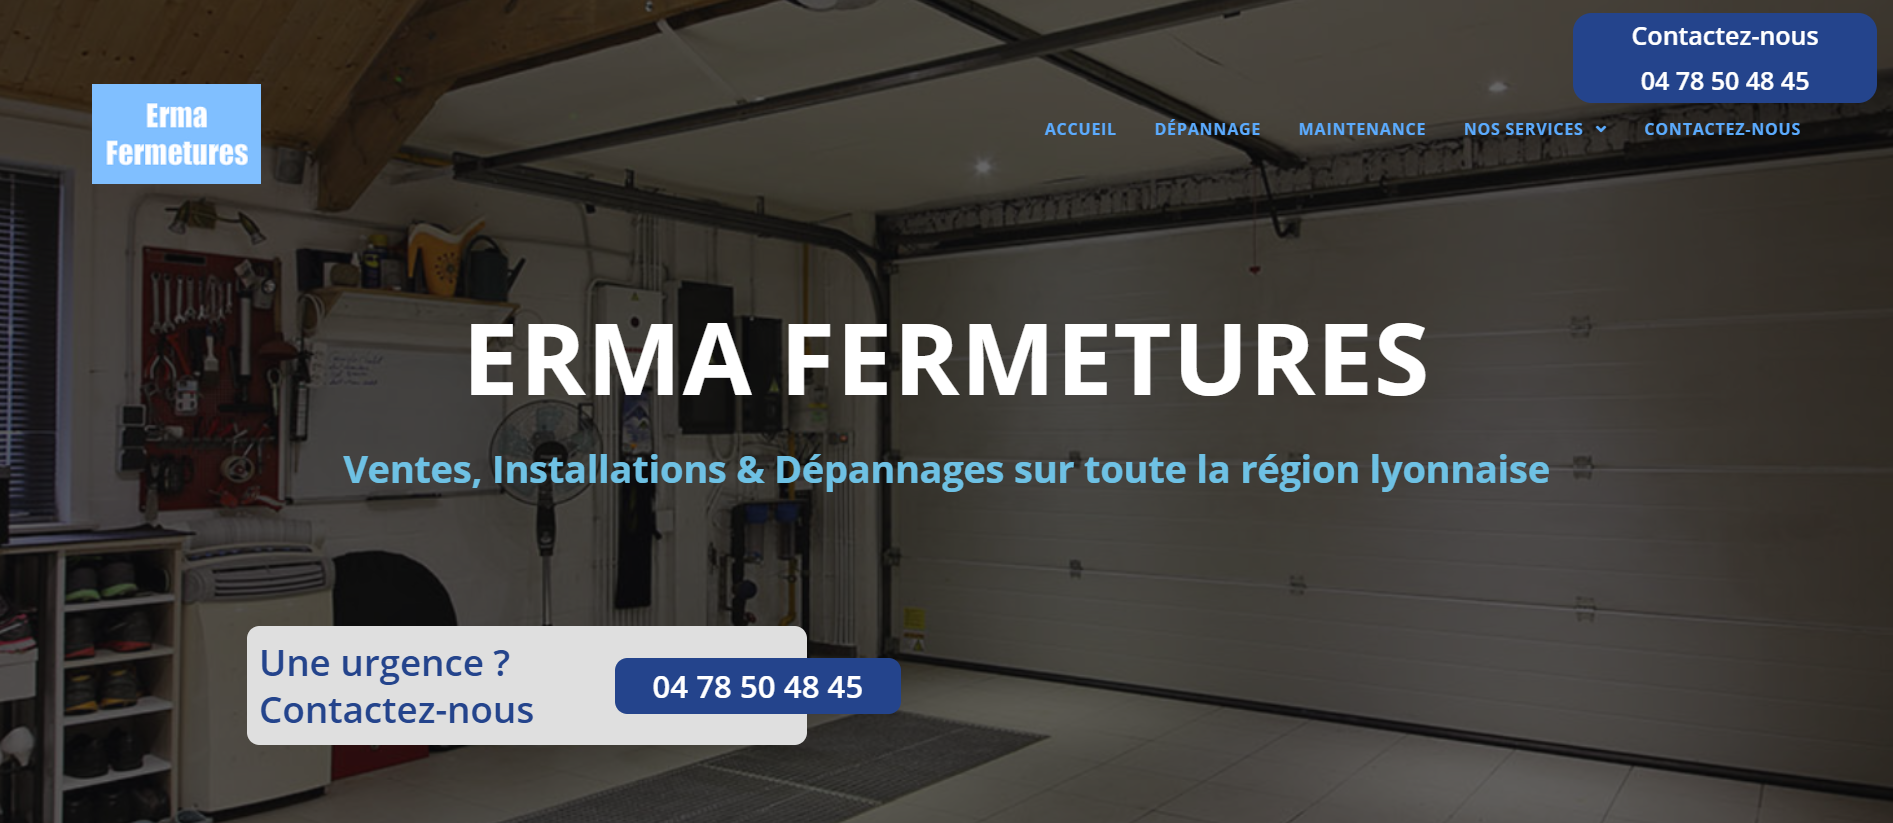 bg erma fermetures